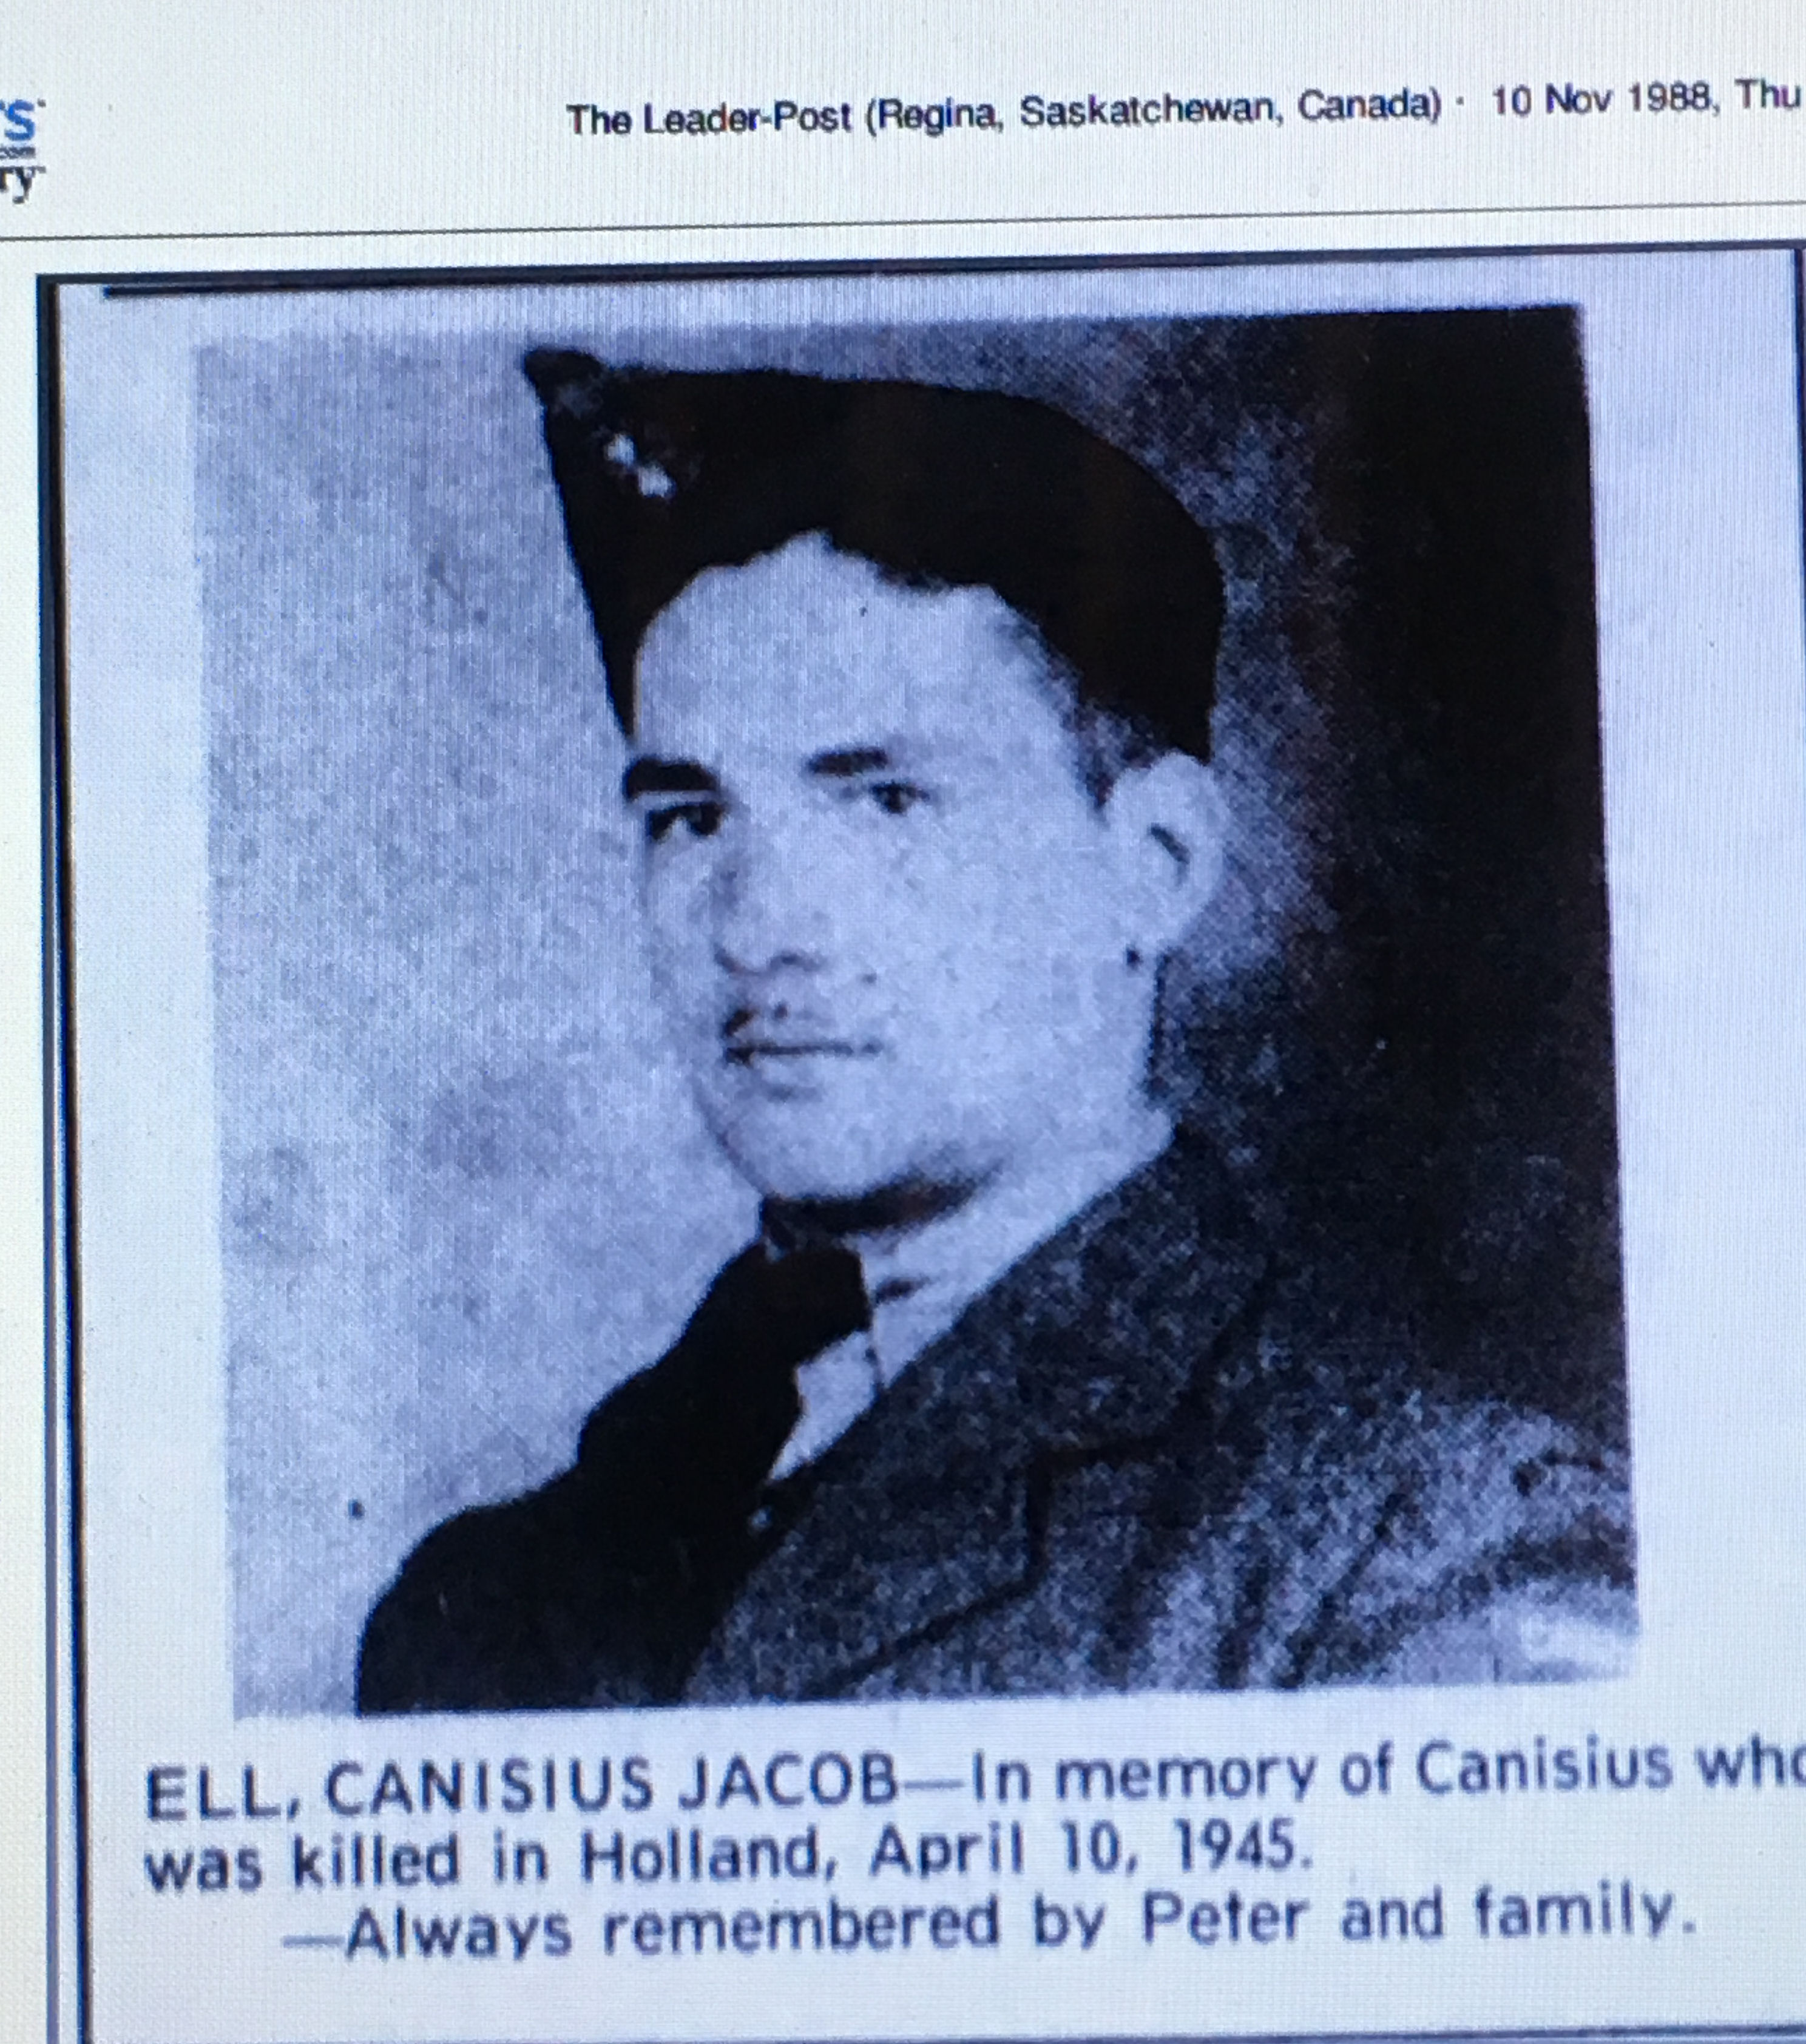 Newspaper clipping– Memorial image from Leader-Post newspaper Regina, Saskatchewan Nov 19 1988 p. 41